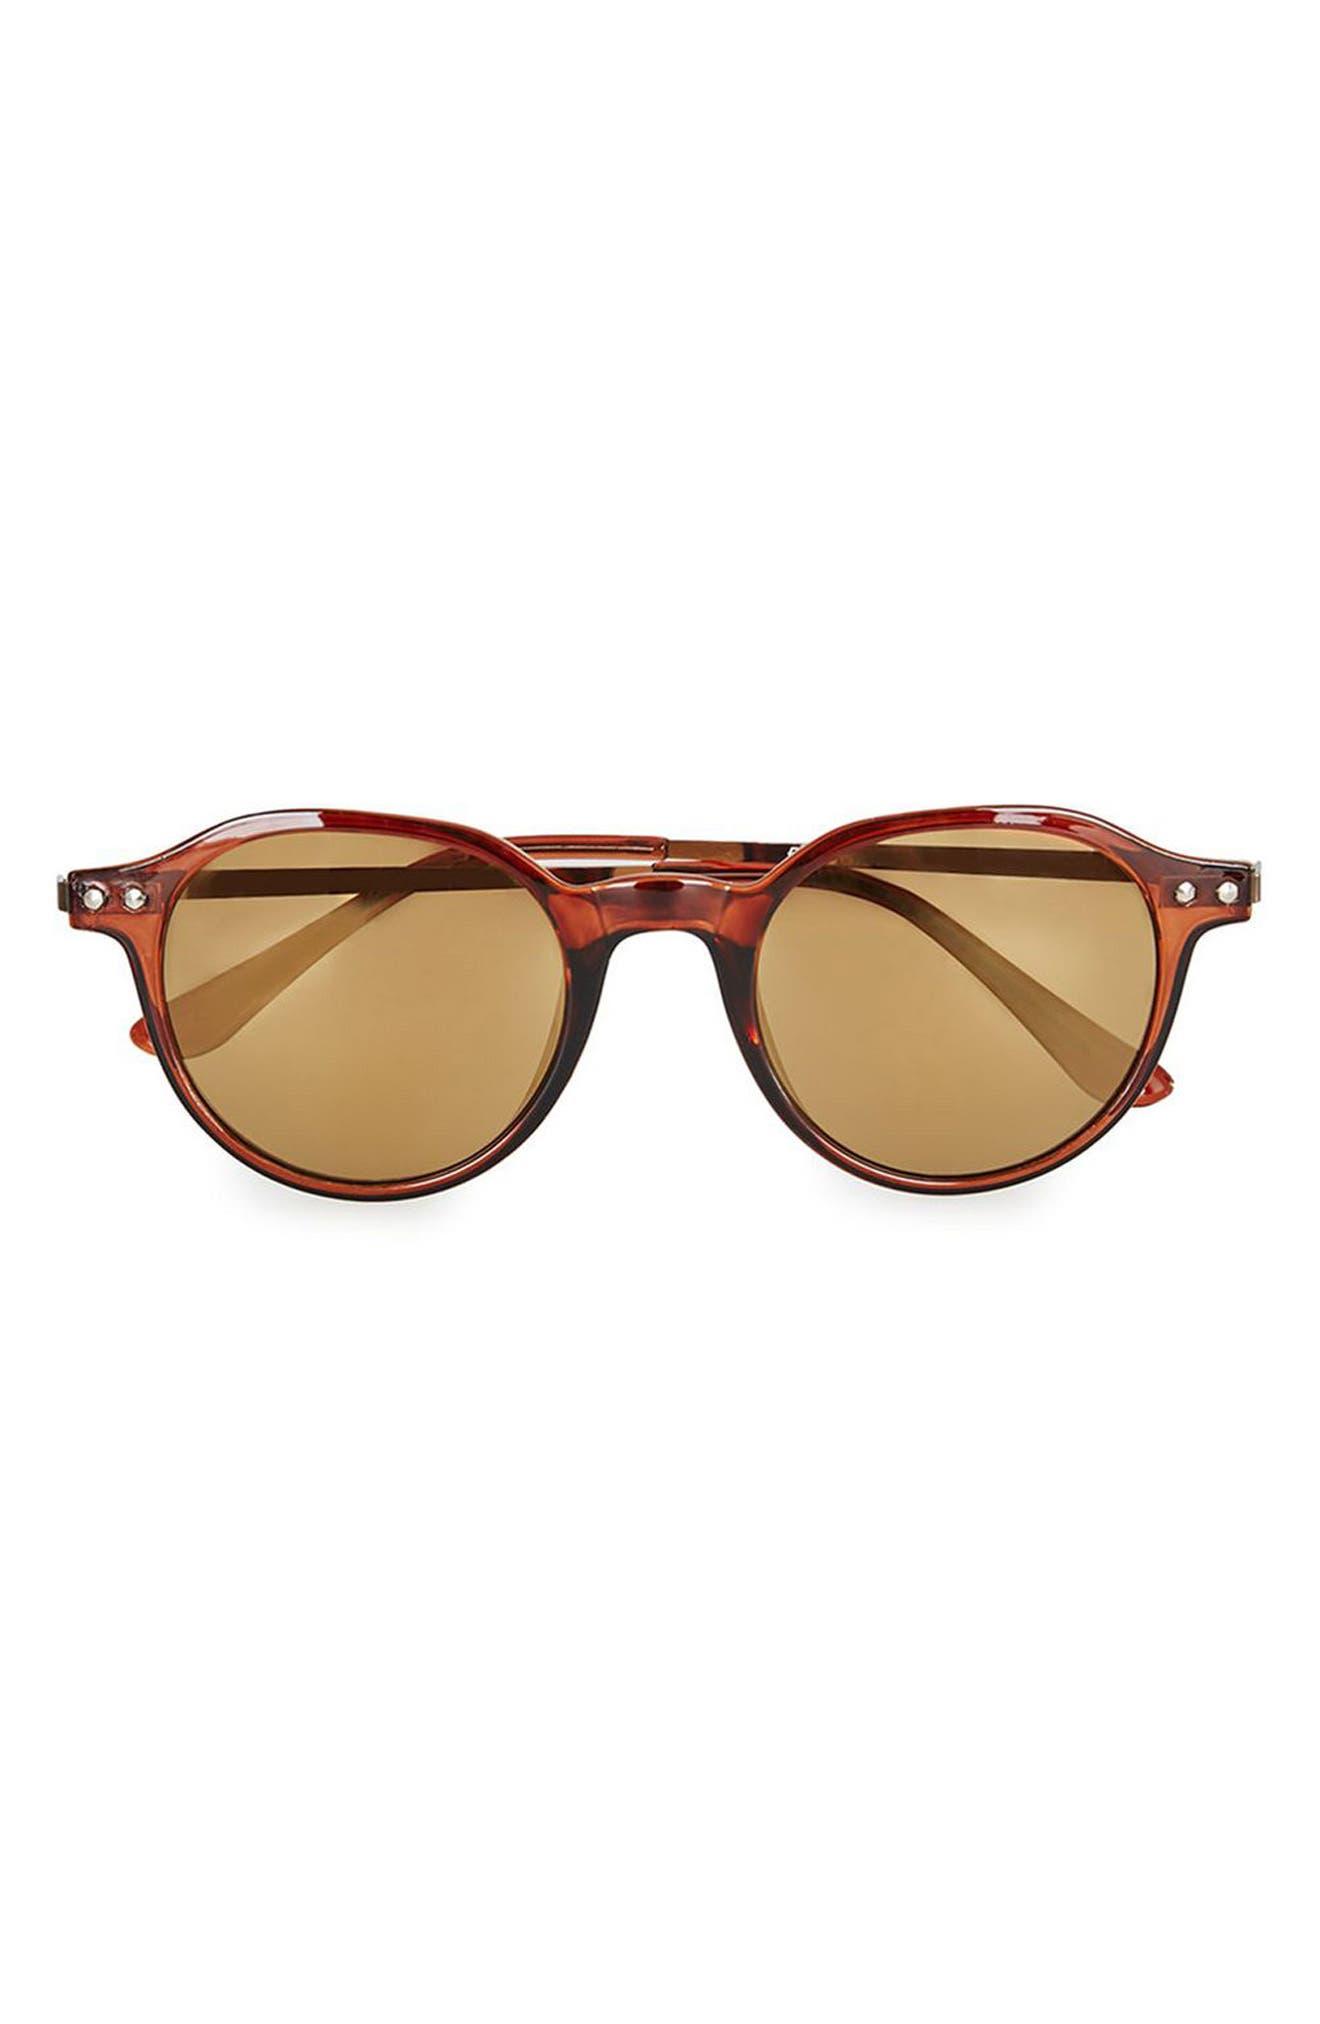 45mm Round Sunglasses,                             Main thumbnail 1, color,                             200